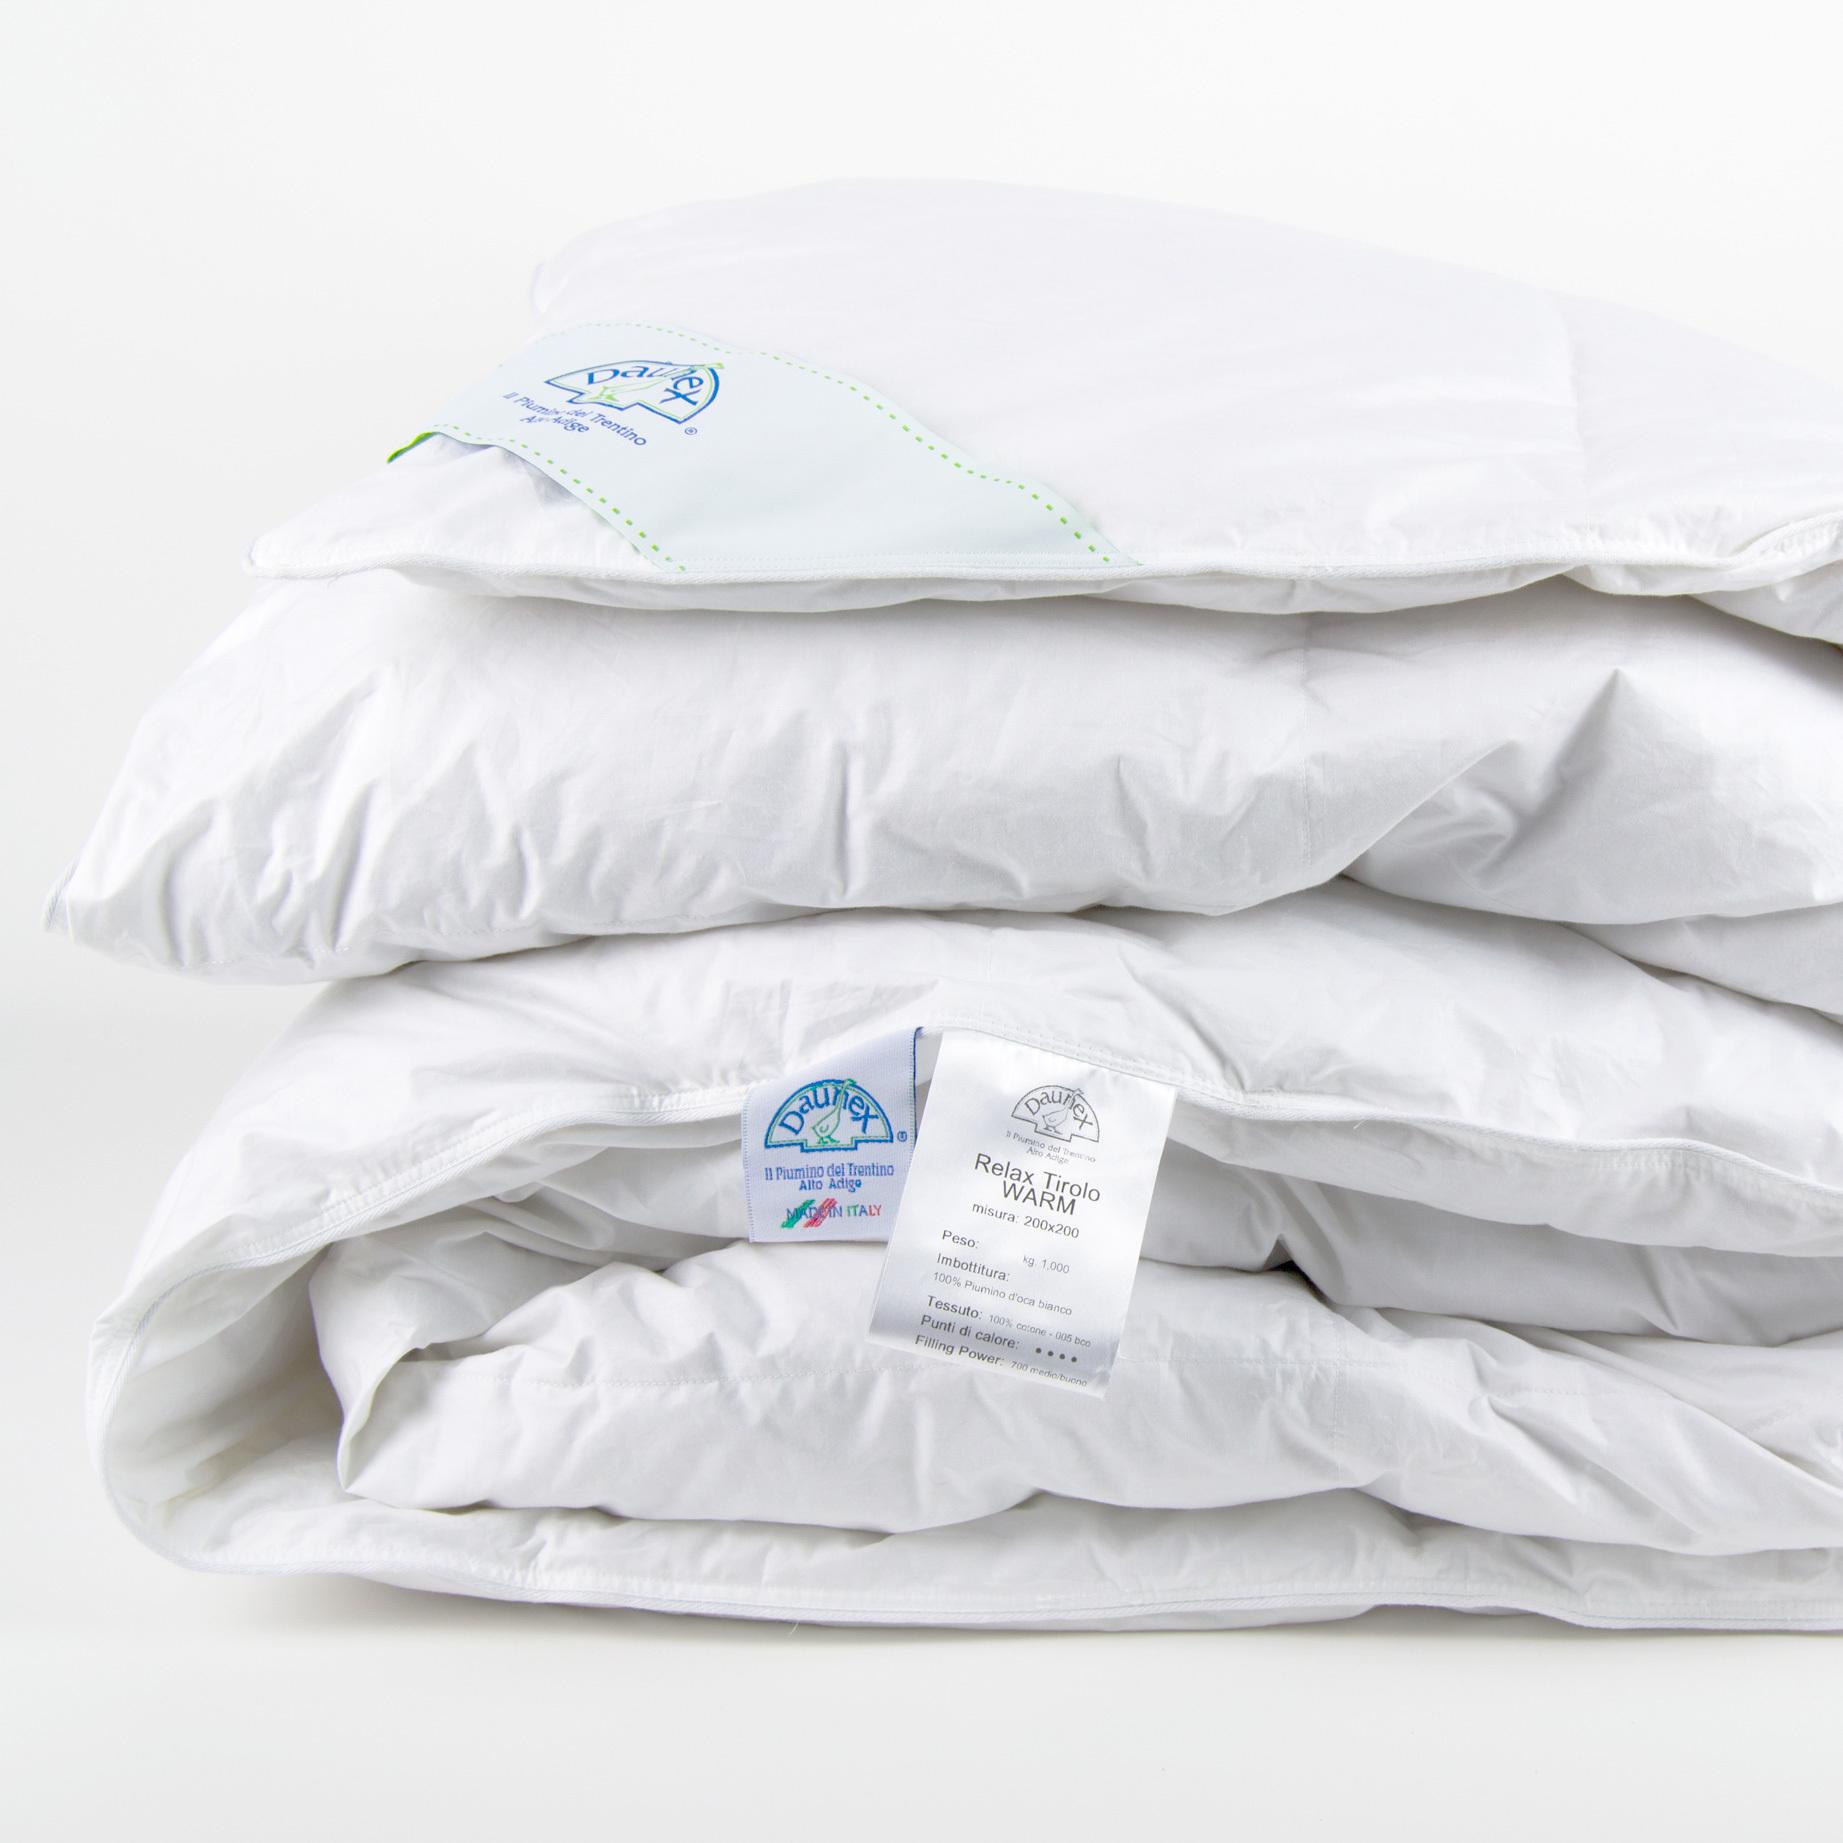 Одеяла Элитное одеяло пуховое 200х200 Tirolo от Daunex elitnoe-odeyalo-puhovoe-200h200-tirolo-ot-daunex-italiya-big.jpg